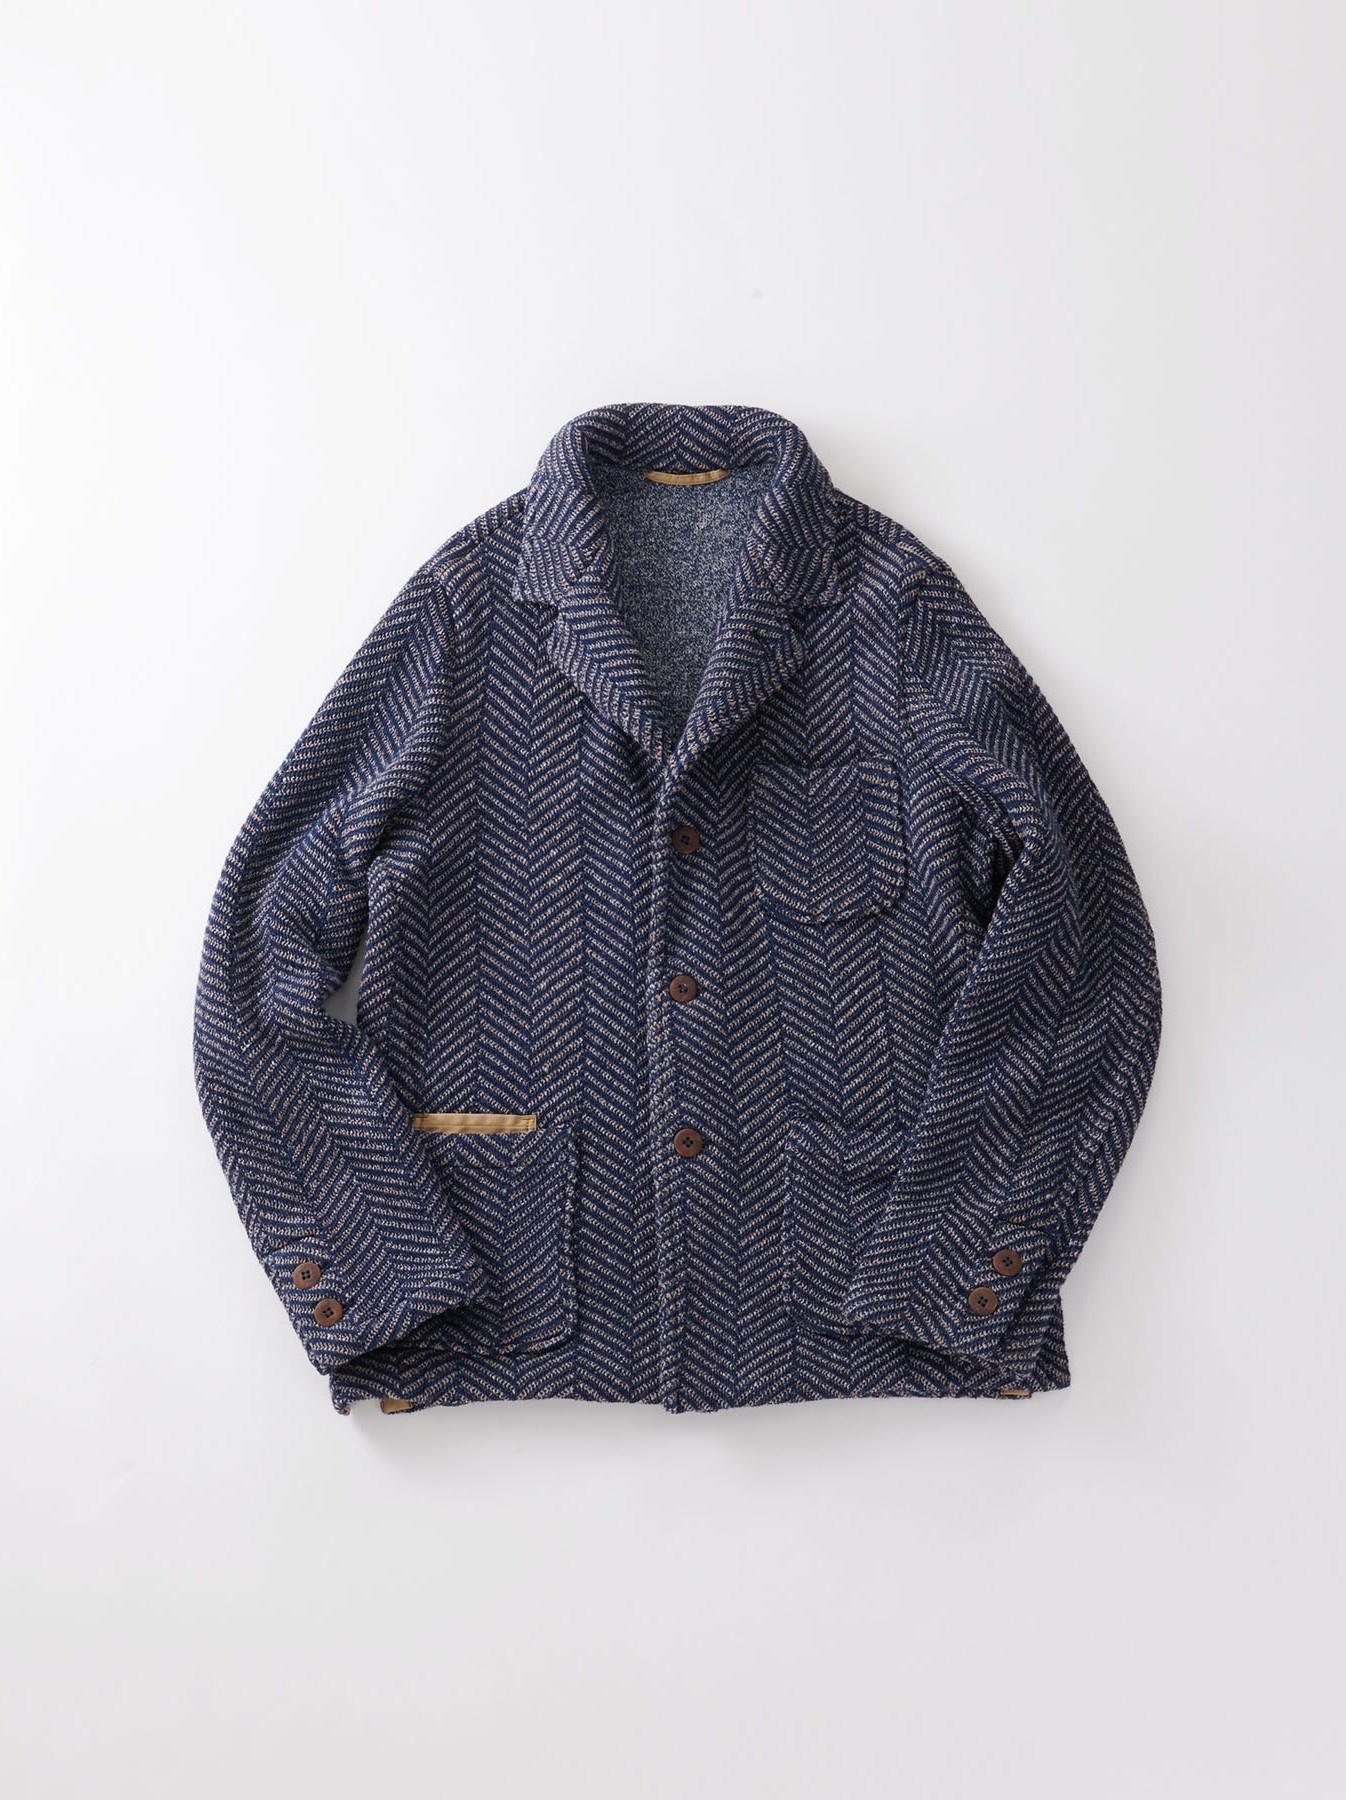 Indigo Cotton Tweed Knit Jacket-1